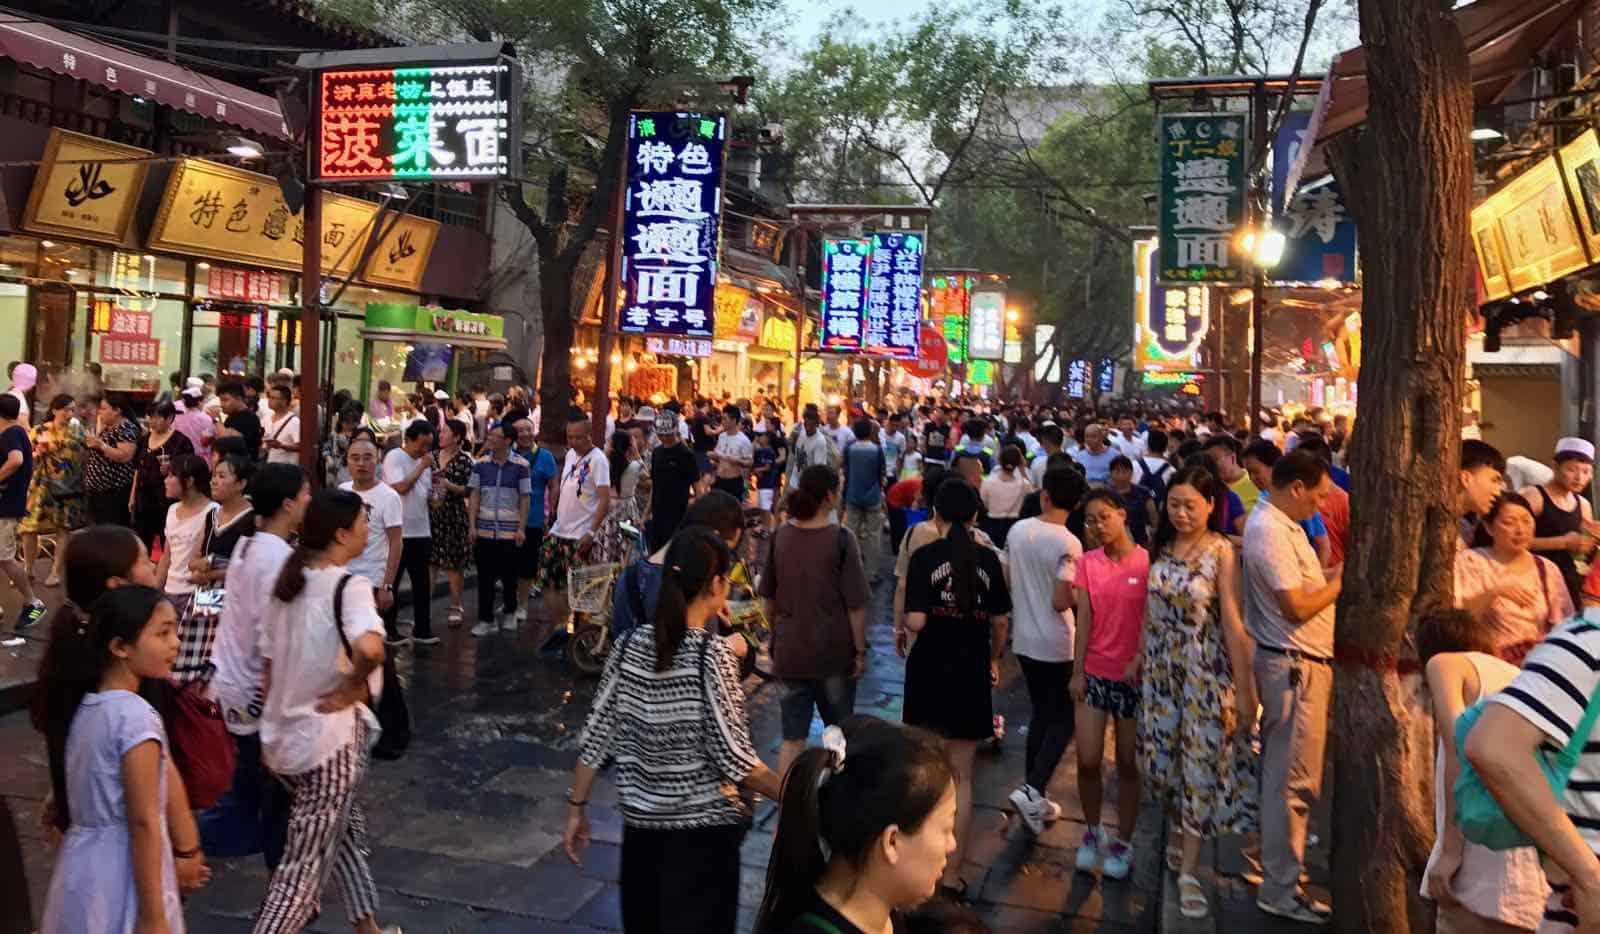 Muslim Street Xian China betternotstop